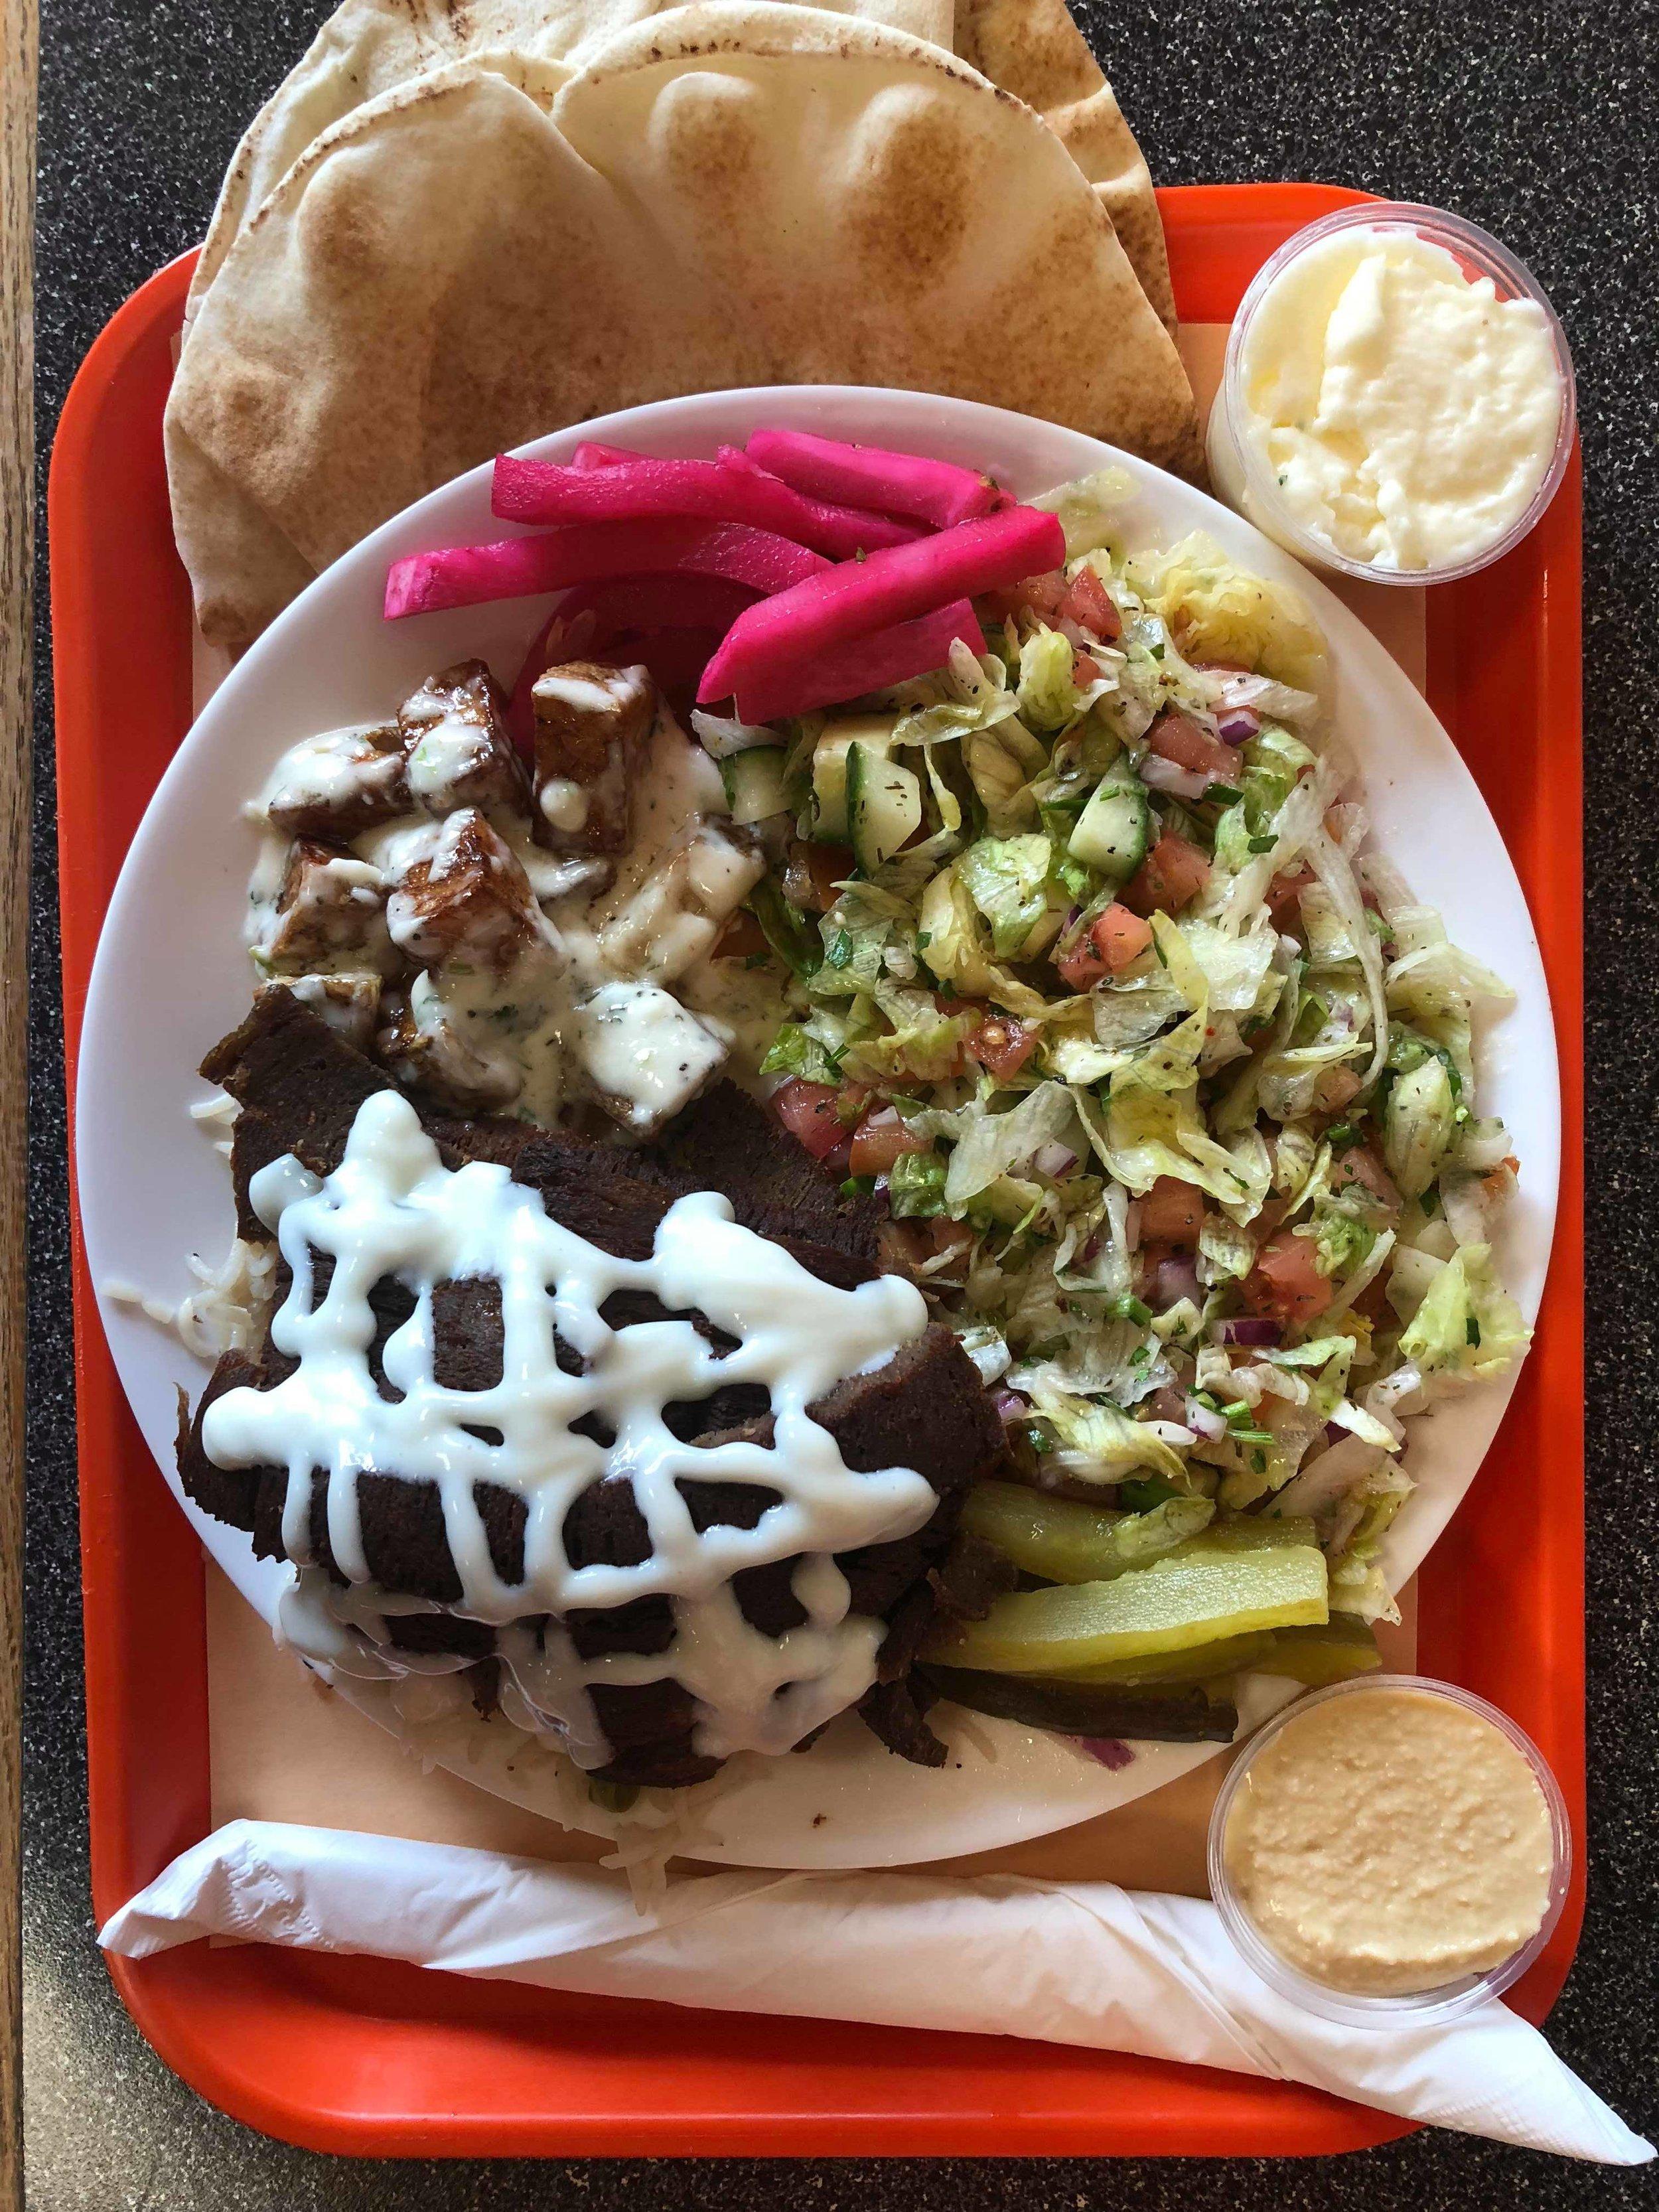 DINNERS - All Dinners include: Garlic Potatoes, Rice, Salad, Pita, Garlic & Hummus dipCHICKEN SHAWARMA - $14.49BEEF DONAIR - $13.49MIX PLATTER (Donair & Chicken) - $14.49FALAFEL - $13.49SOUVLAKI - $14.49